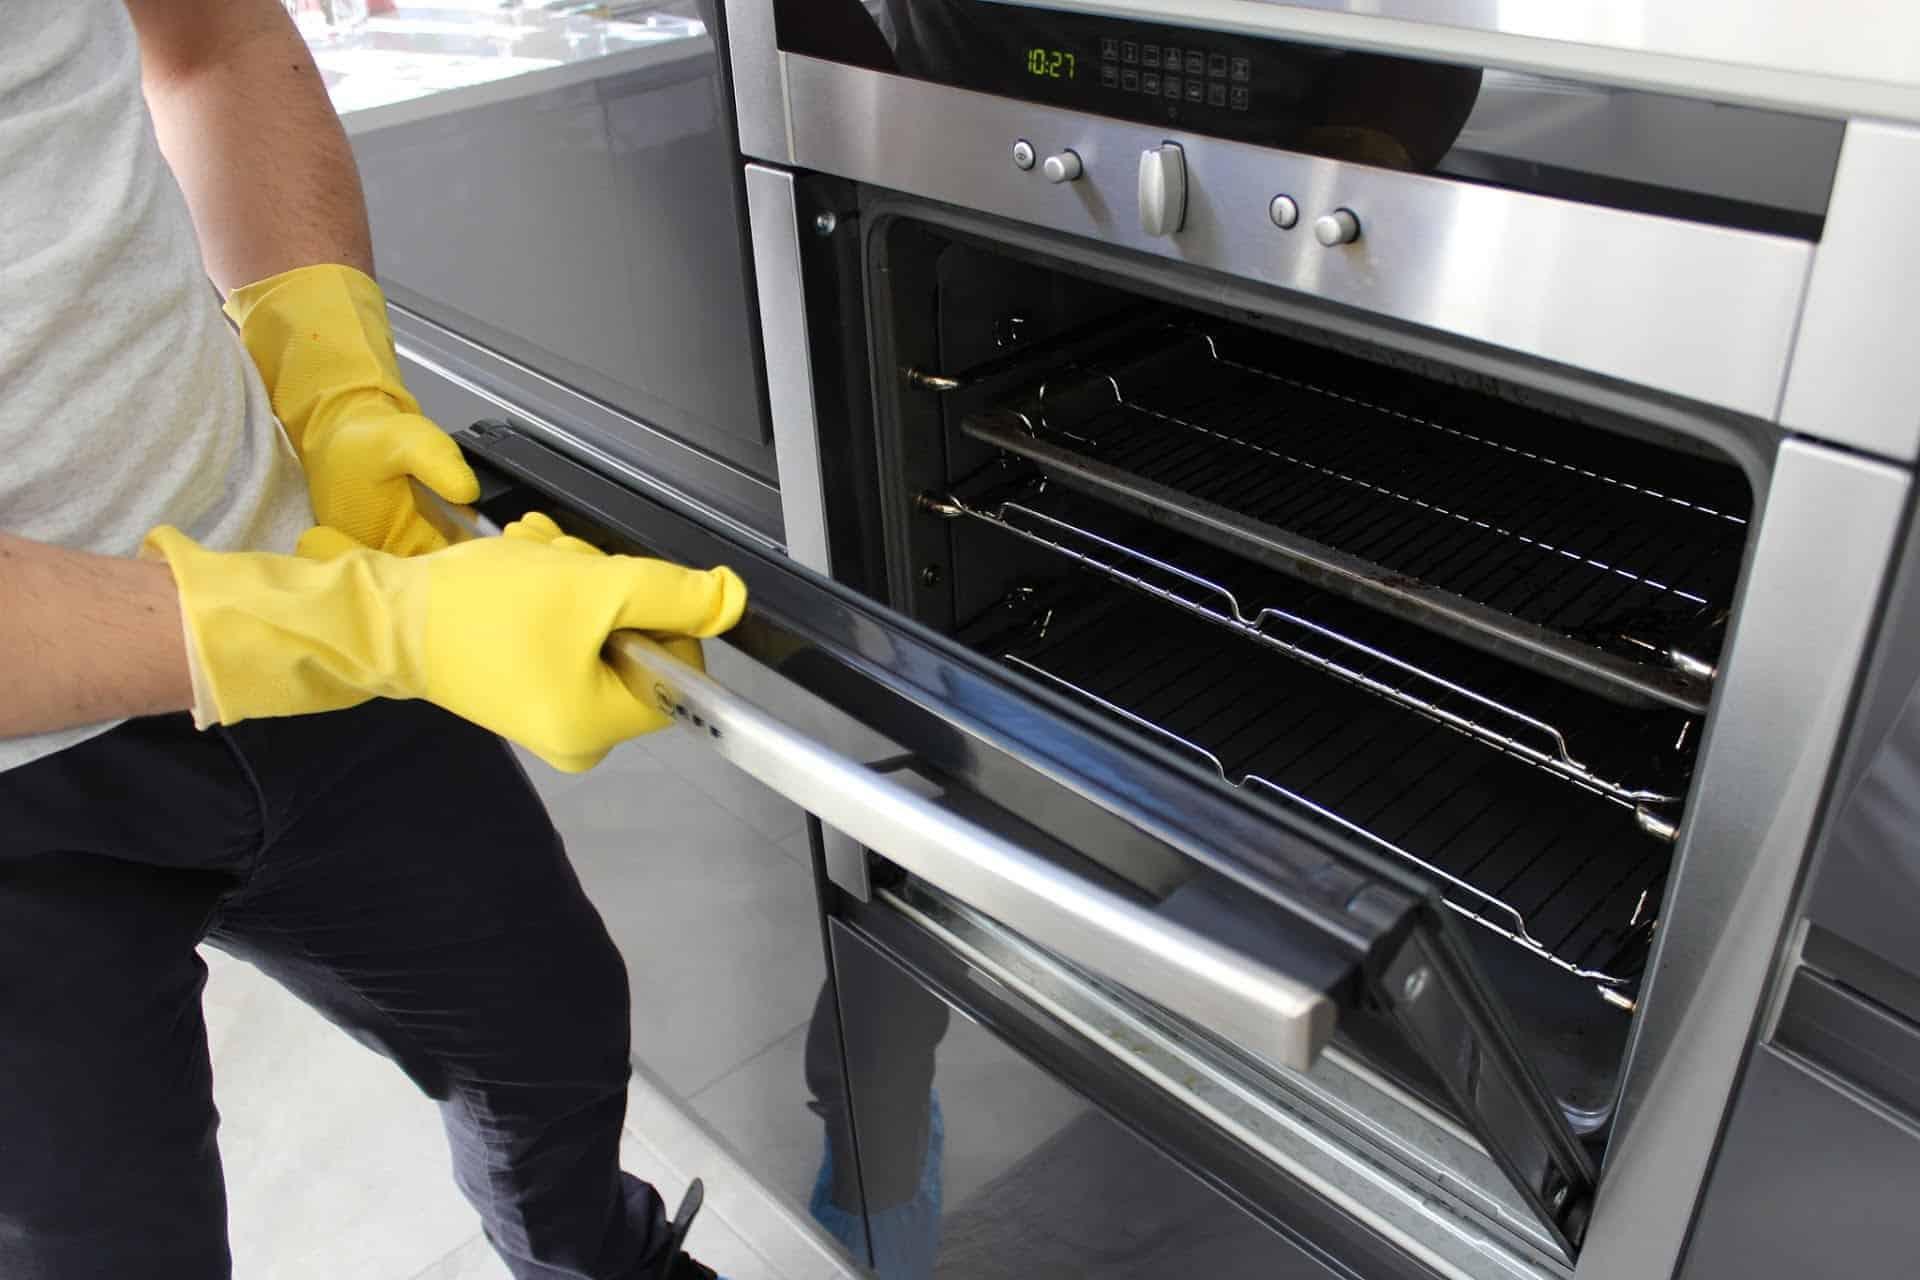 limpiar un horno